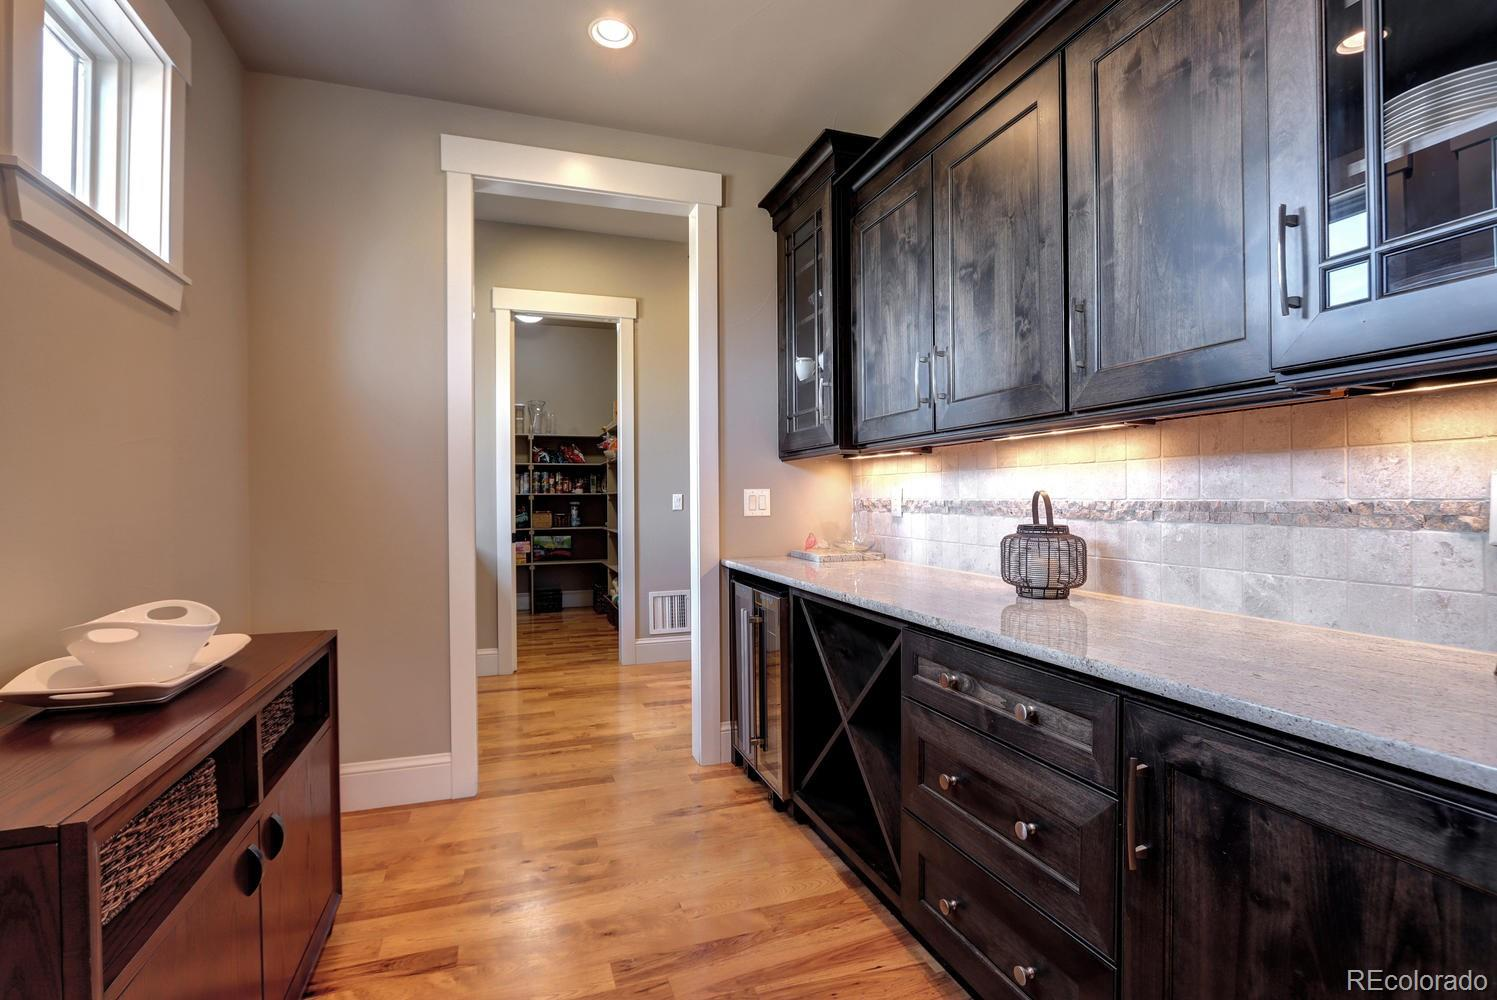 MLS# 9771927 - 5 - 2130 S Cook Street, Denver, CO 80210